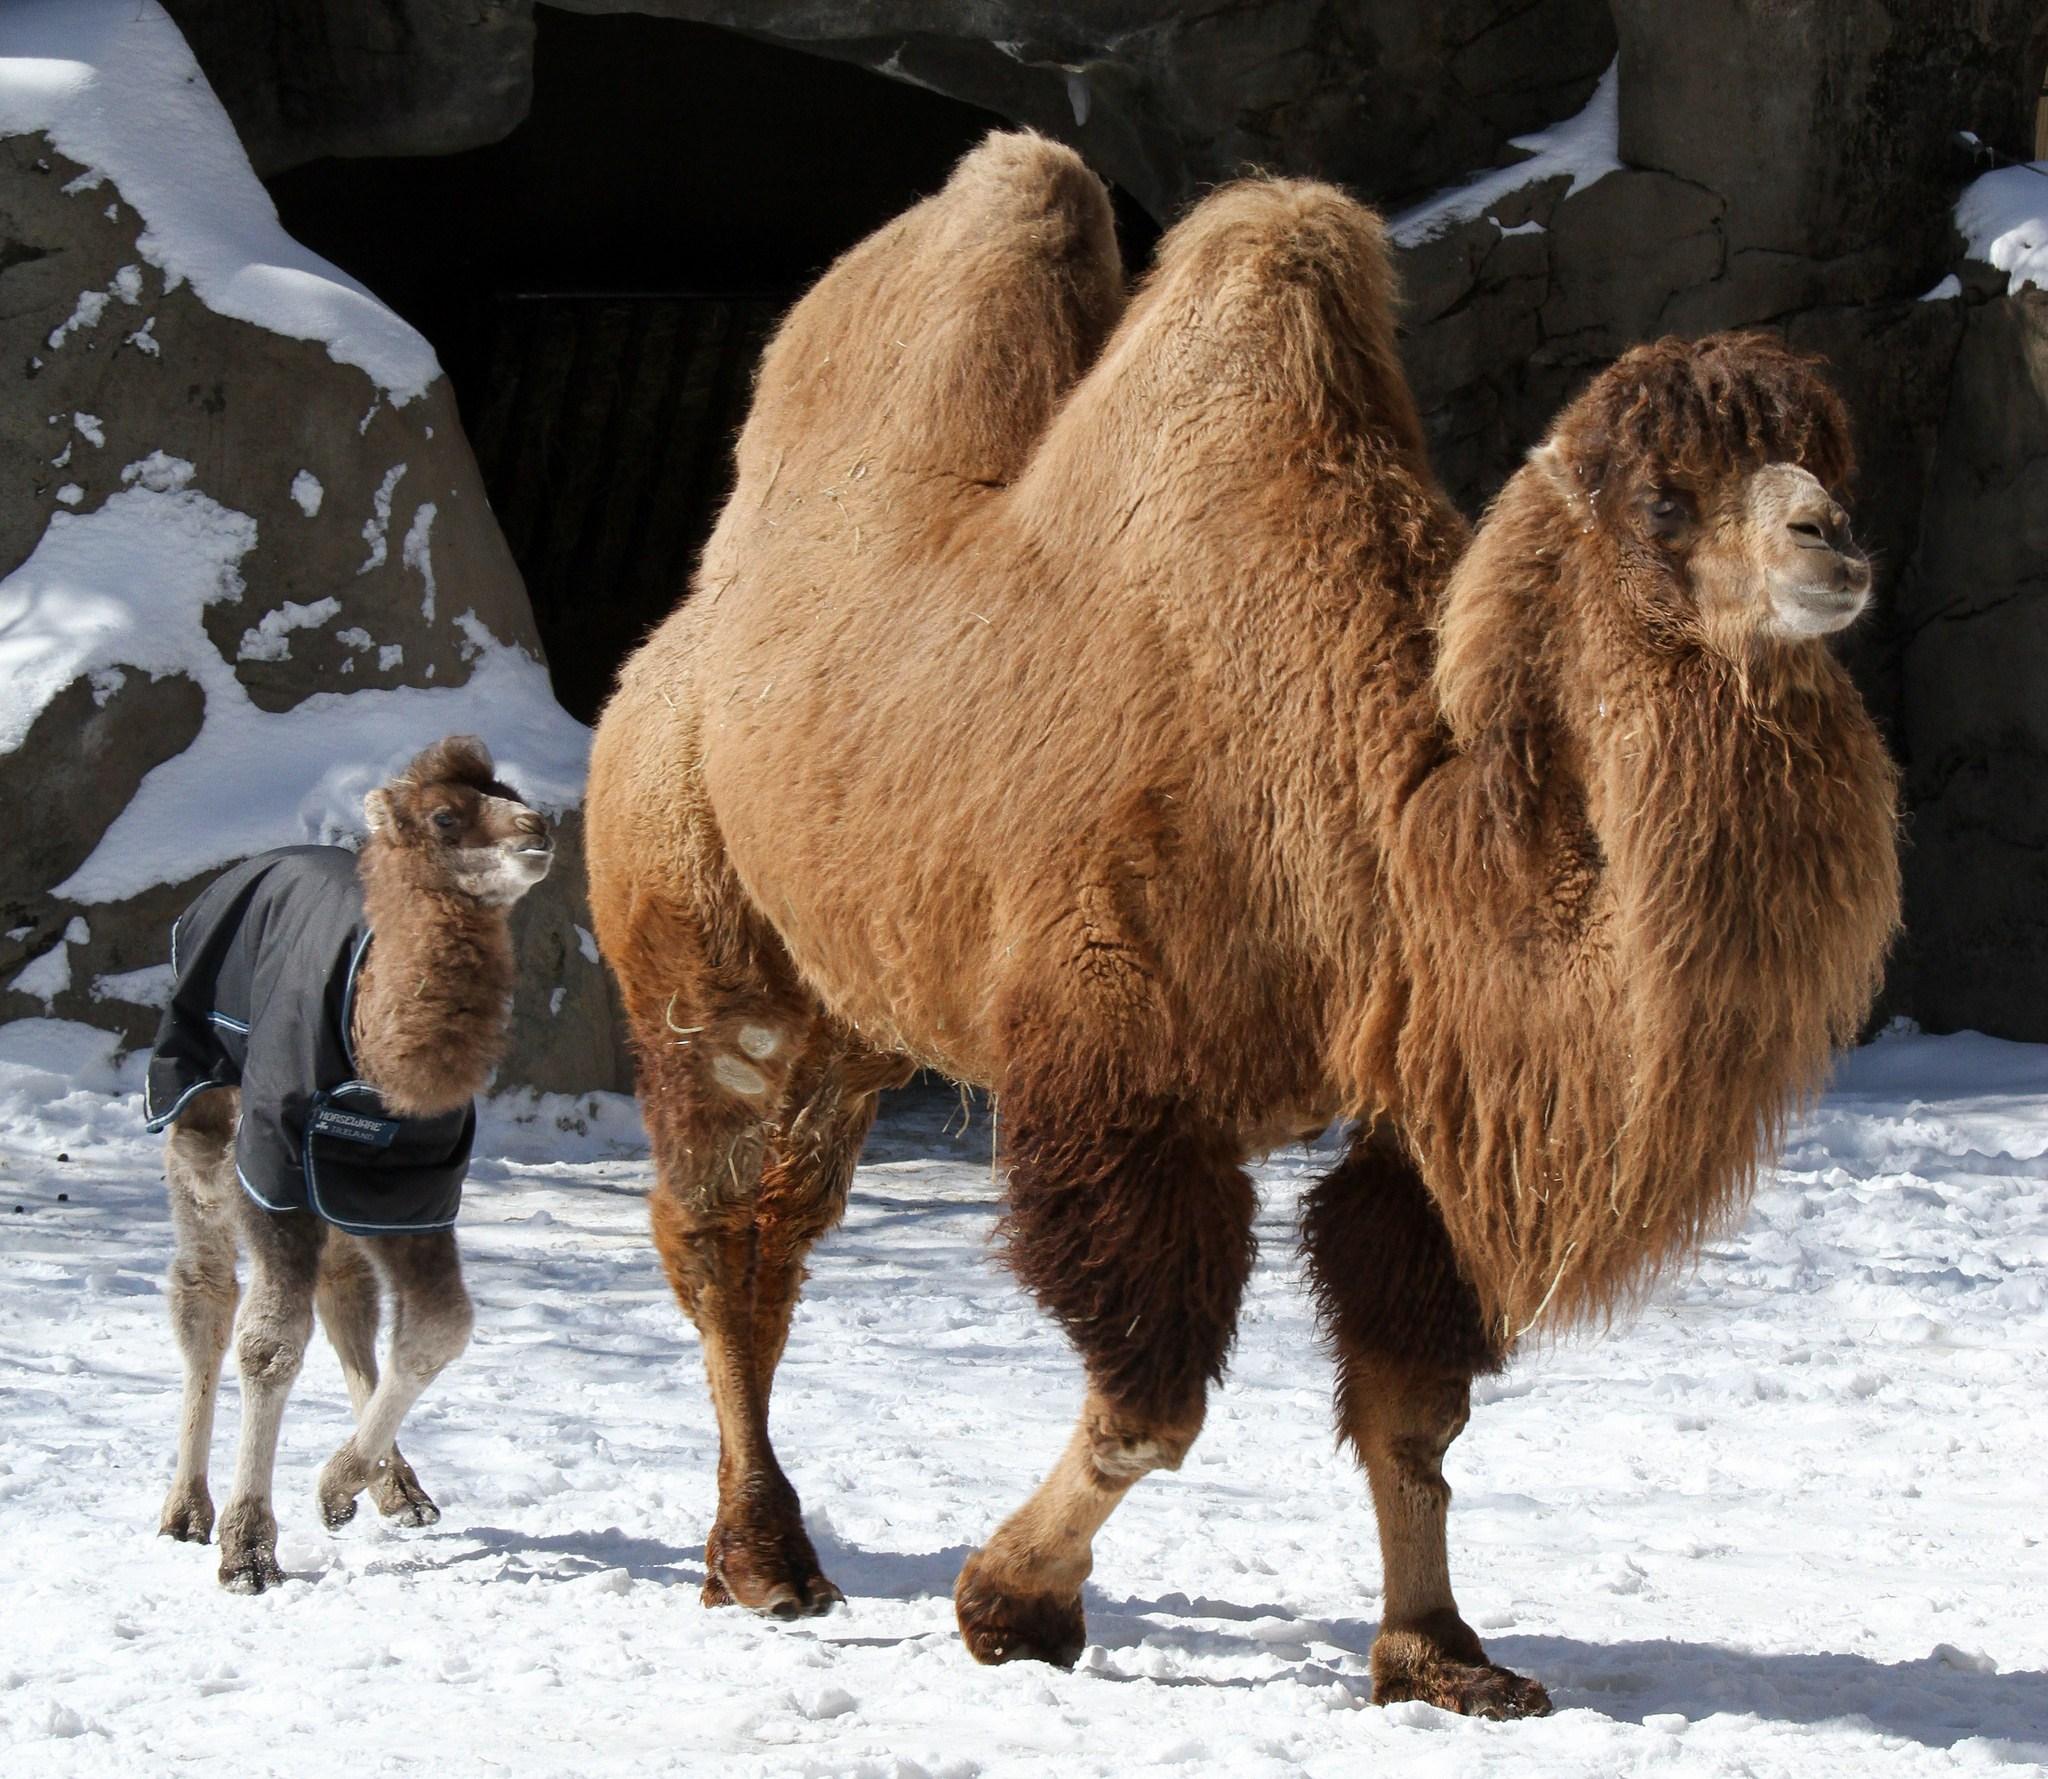 Camel Showdown: Dromedary vs Bactrian